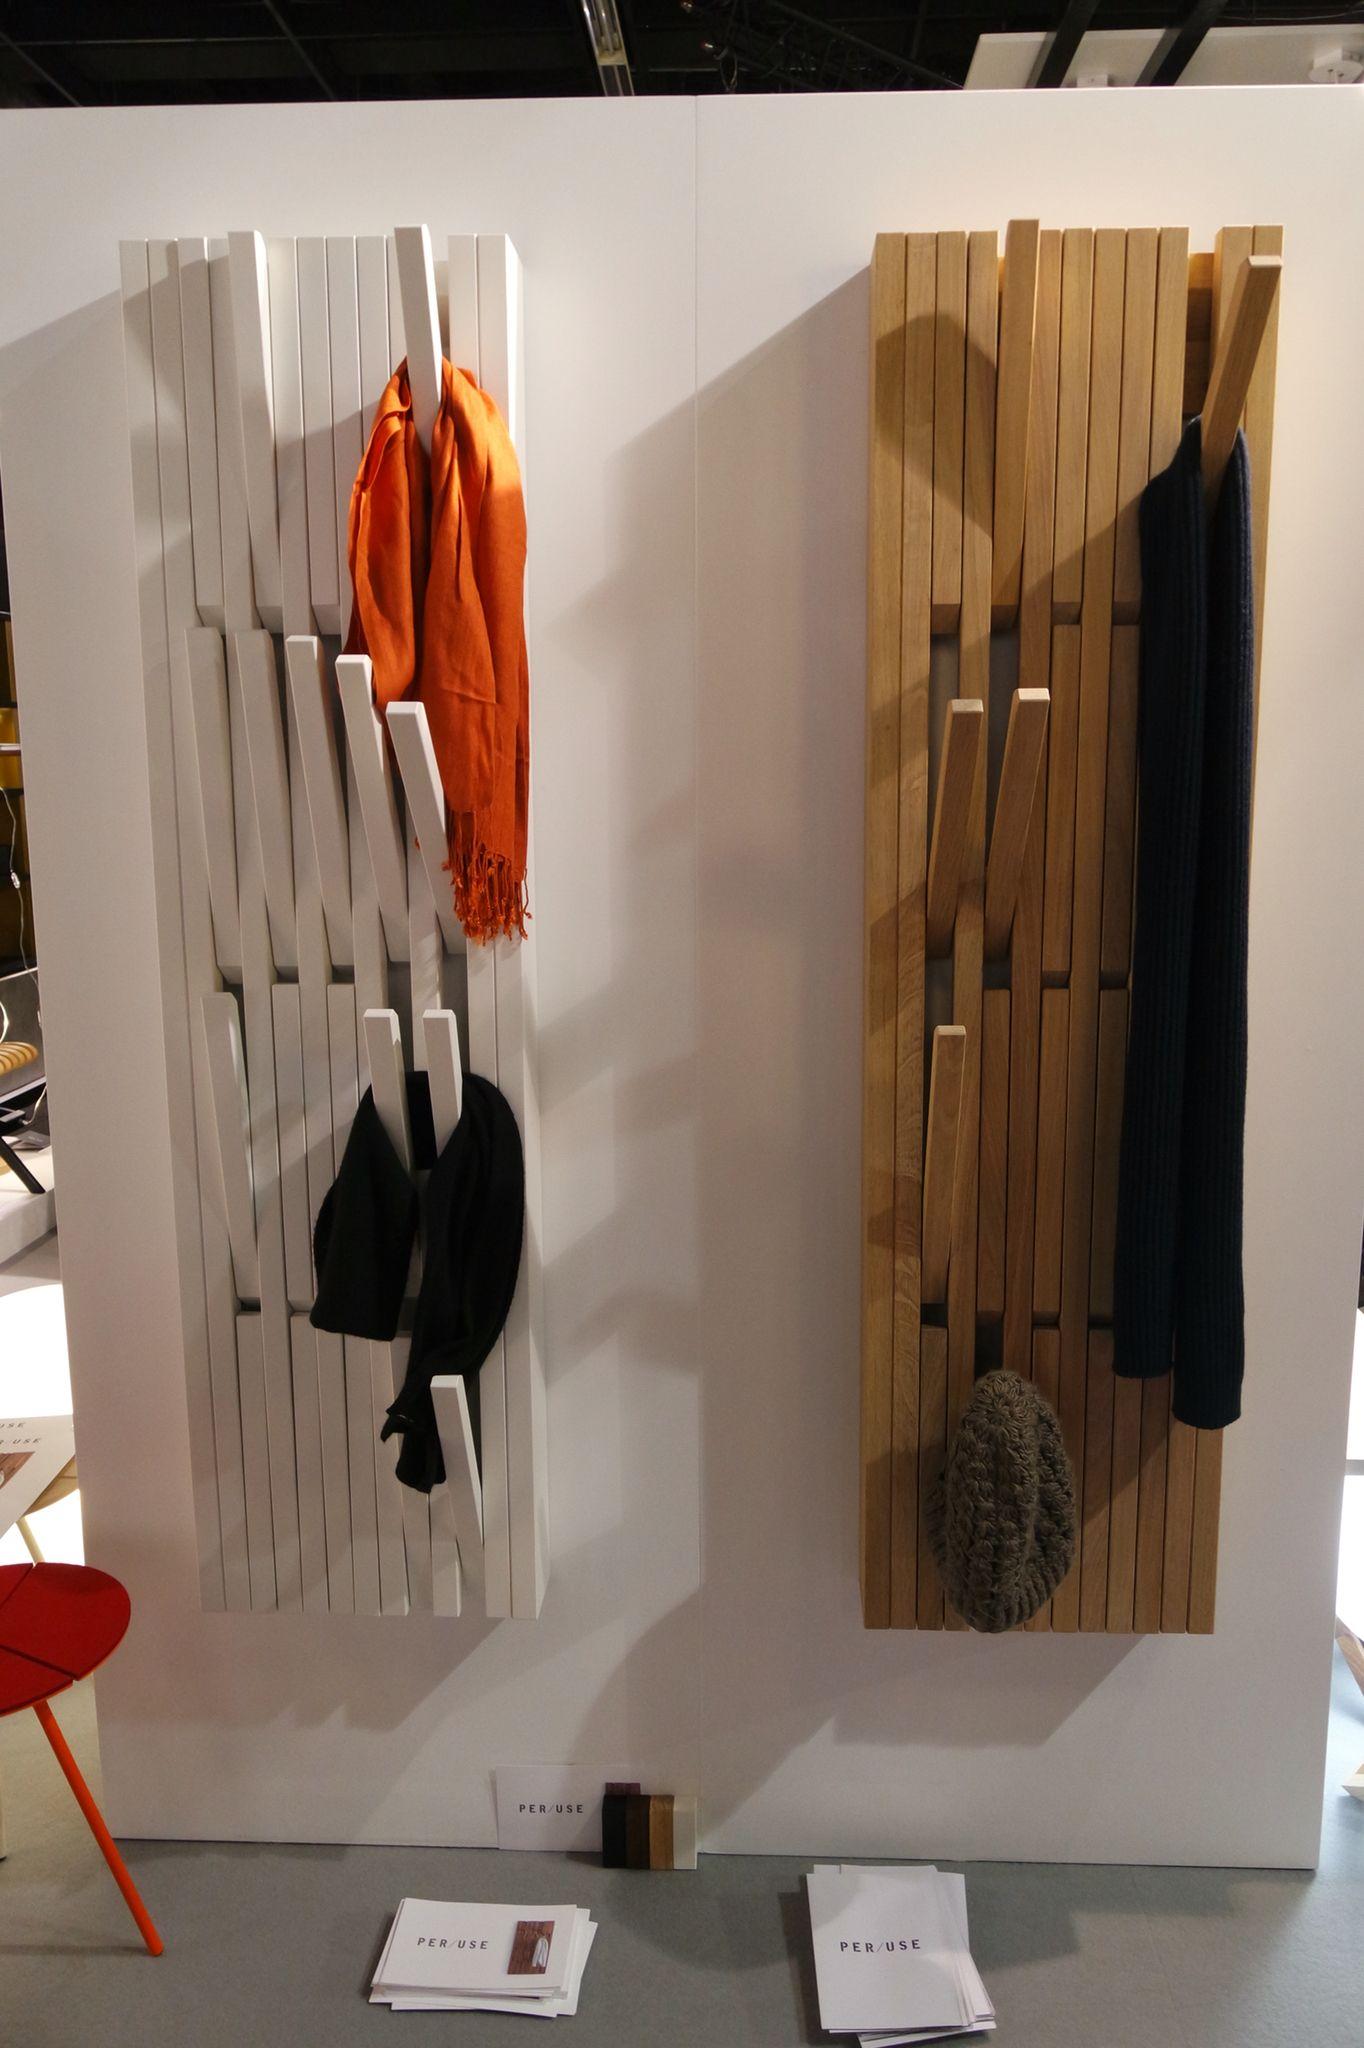 garderobe der firma per use imm cologne 2016 pinterest coat racks and organizing. Black Bedroom Furniture Sets. Home Design Ideas